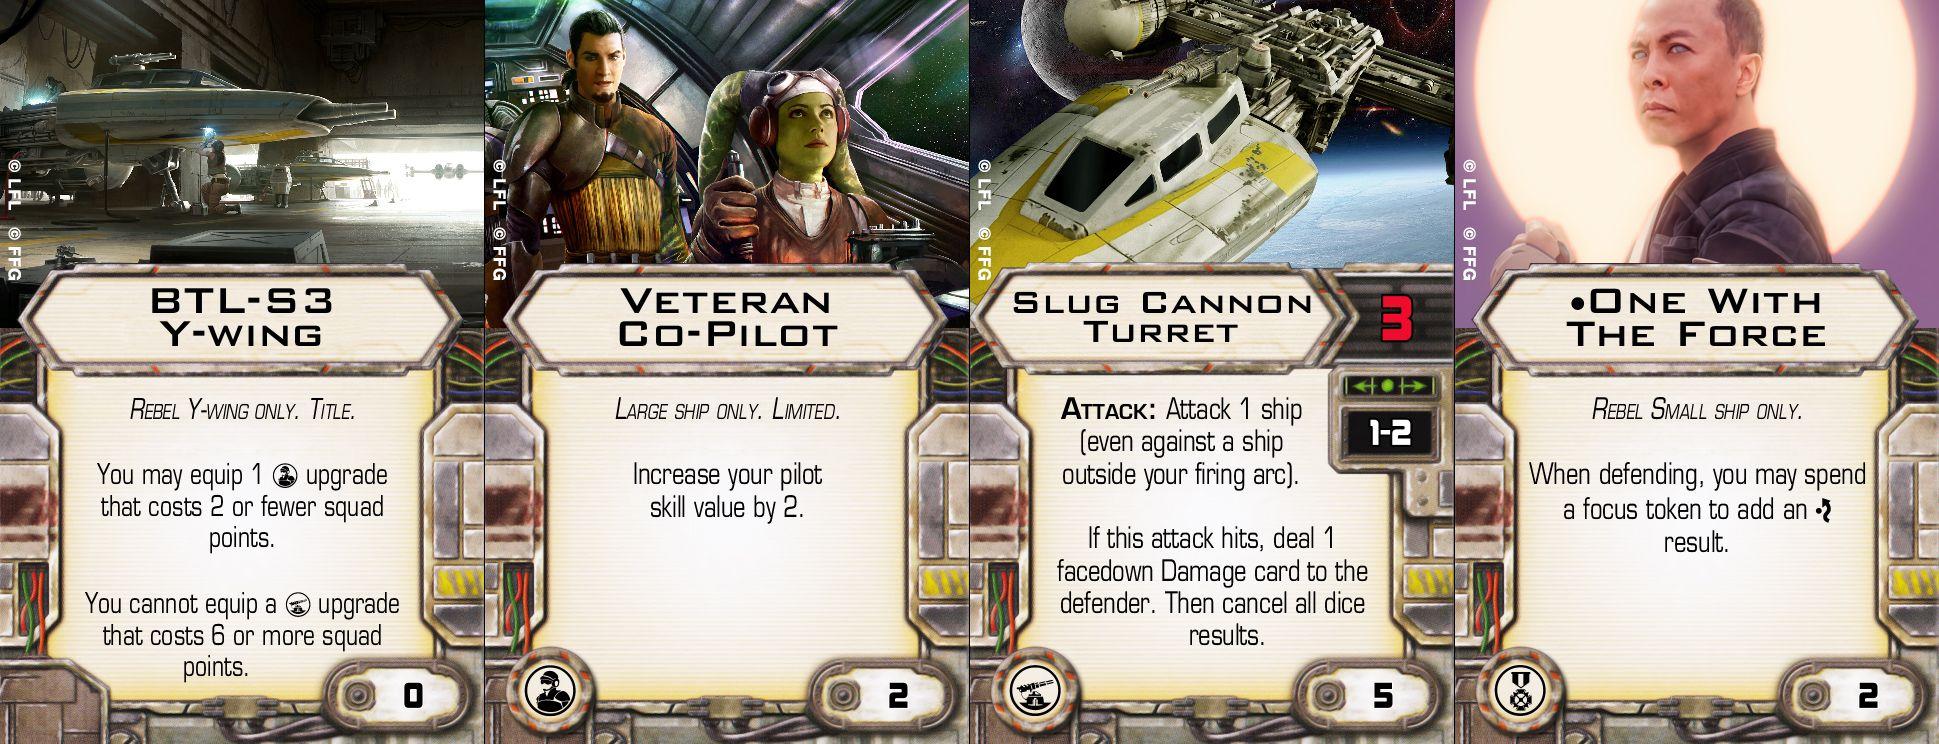 Pin On Star Wars Miniatures